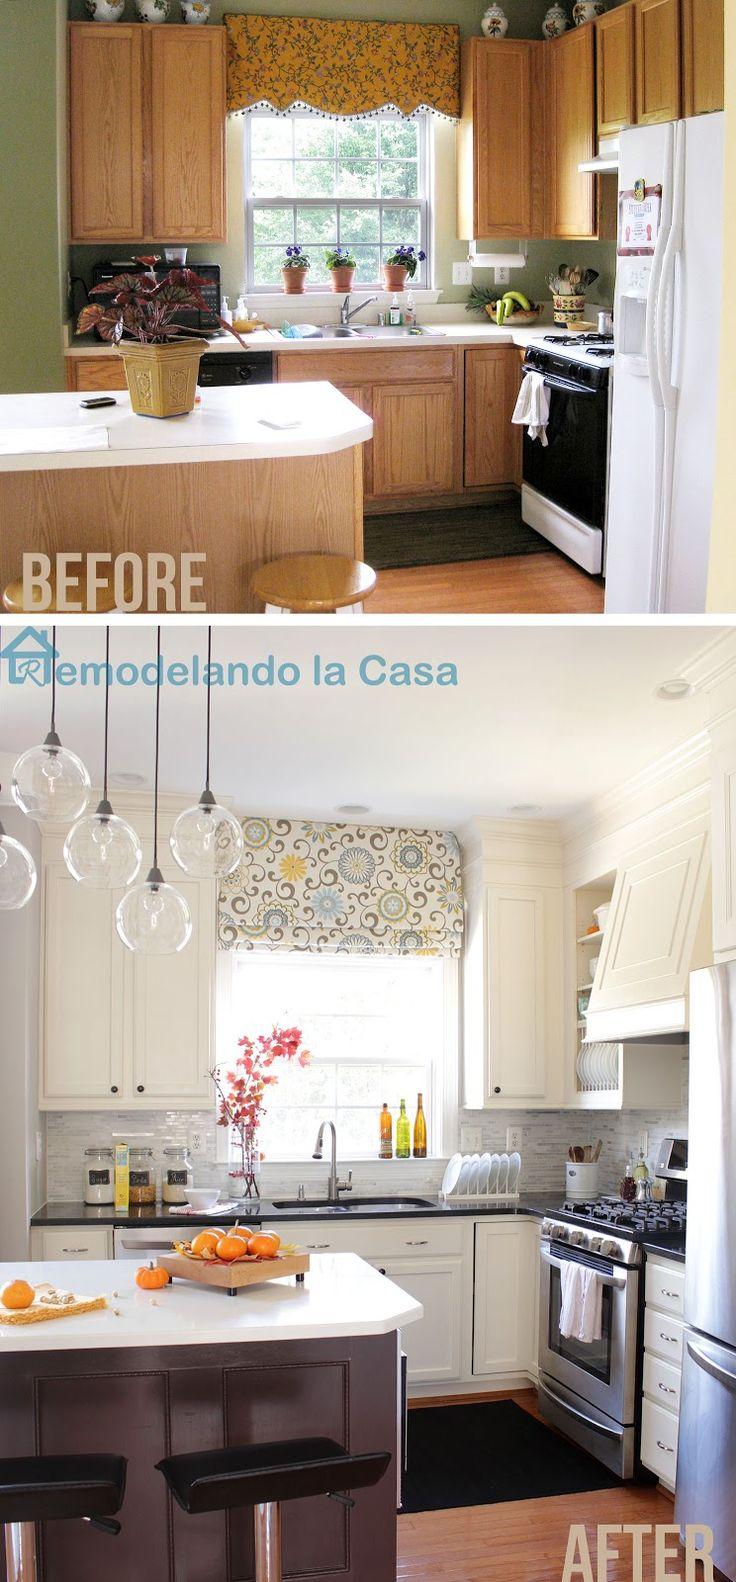 Remodelando la Casa: Same cabinets and island - Kitchen re-do on a budget.